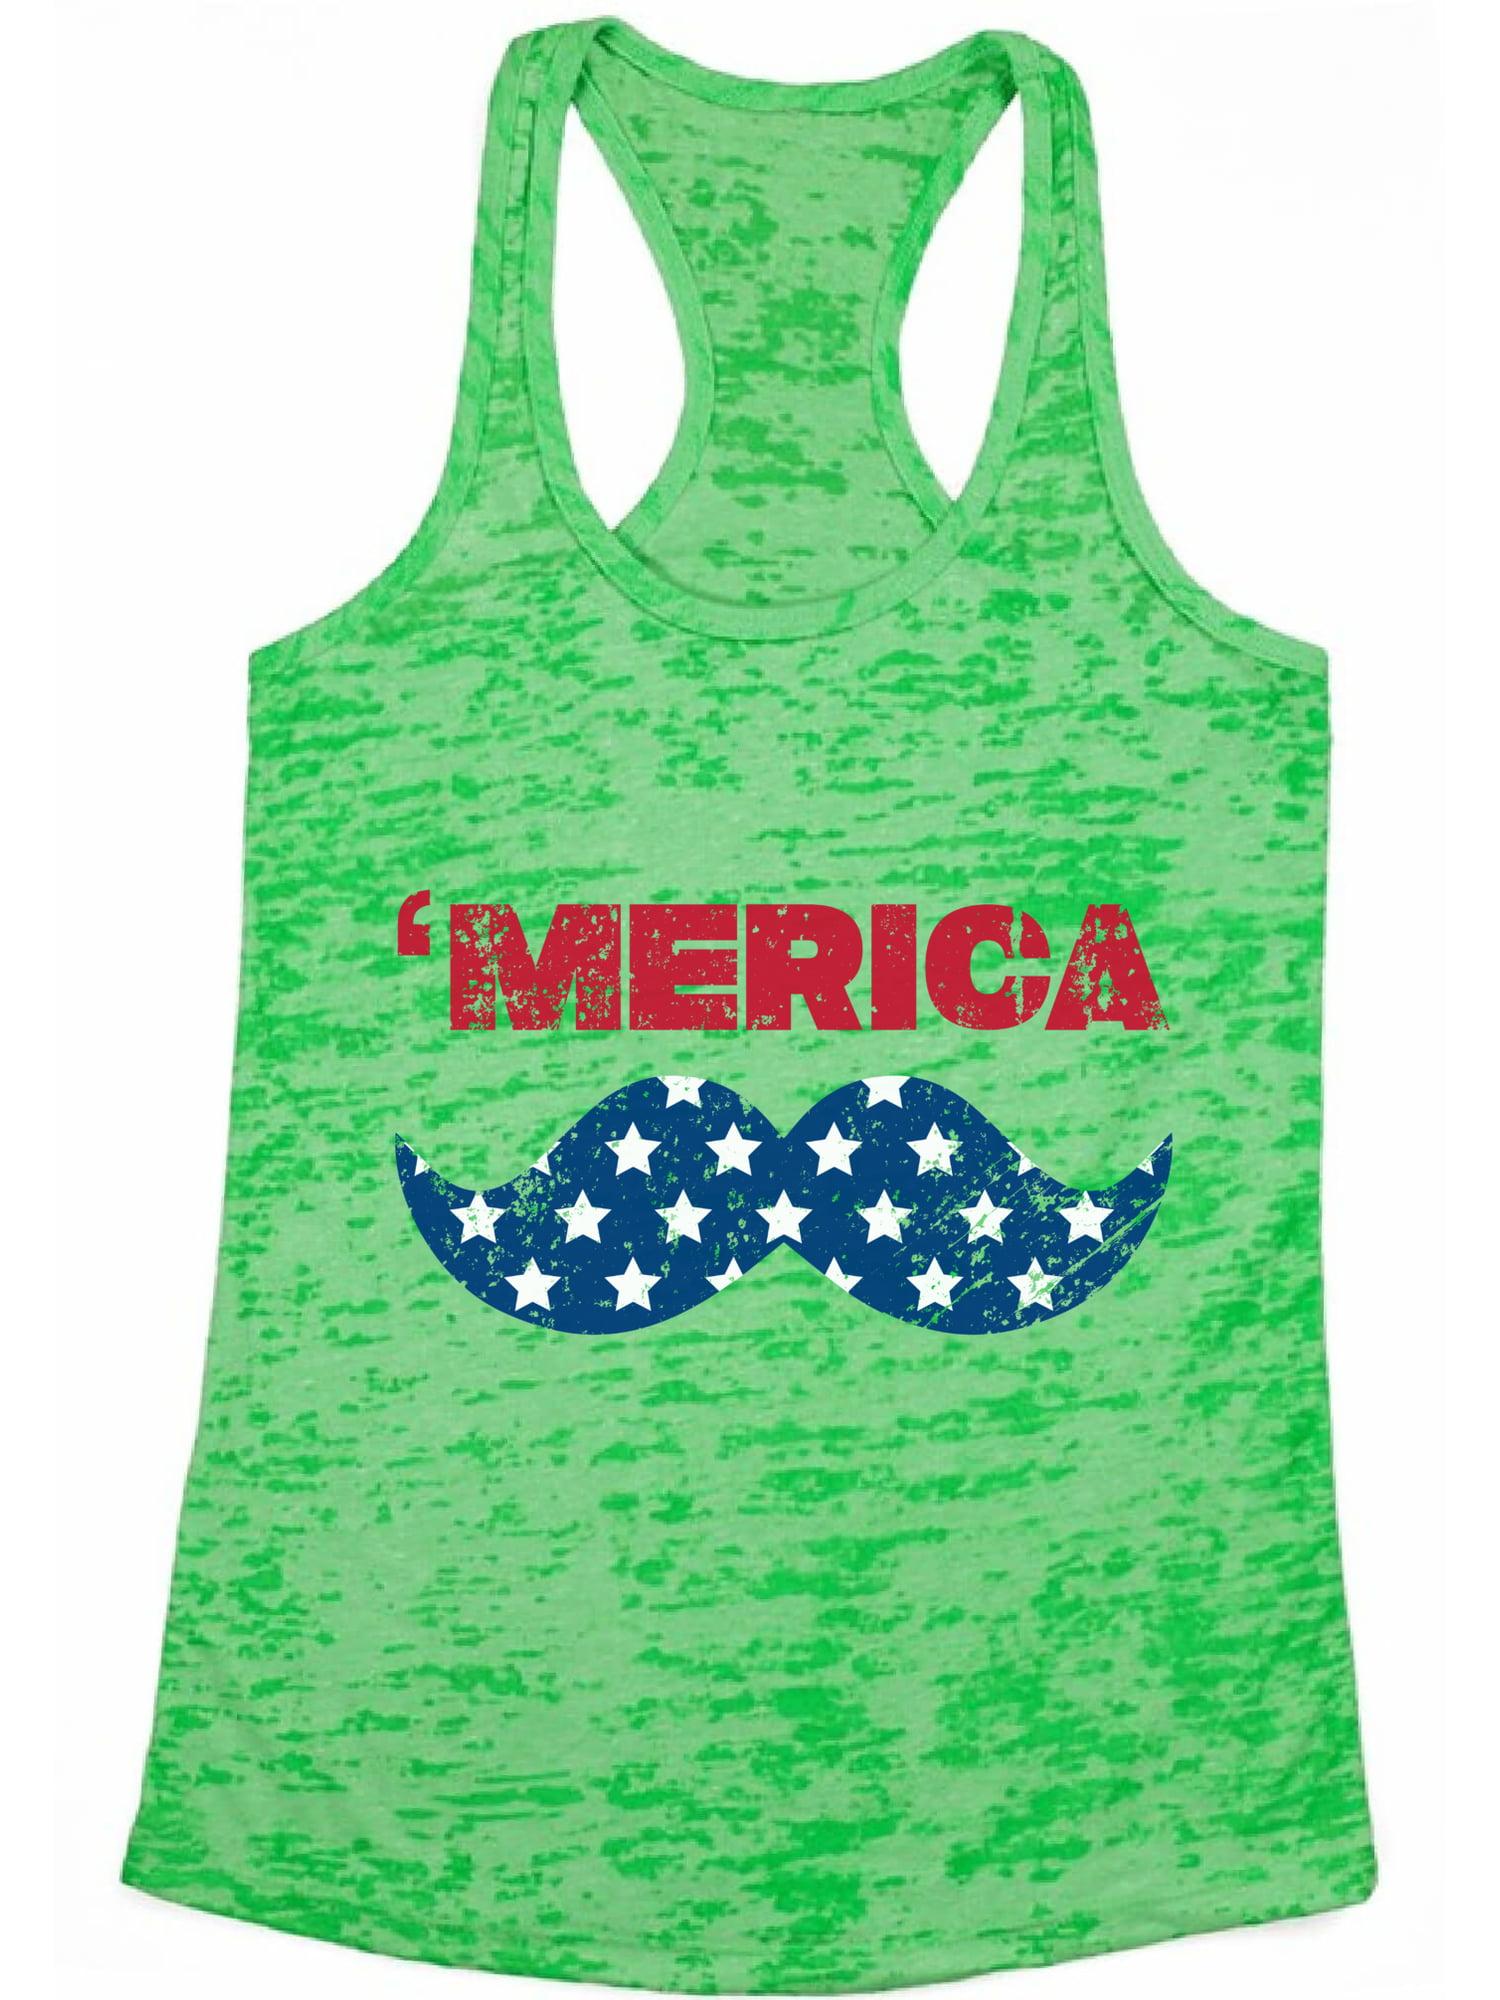 Tcombo Merica USA Flag 4th of July America Mens Sleeveless Shirt